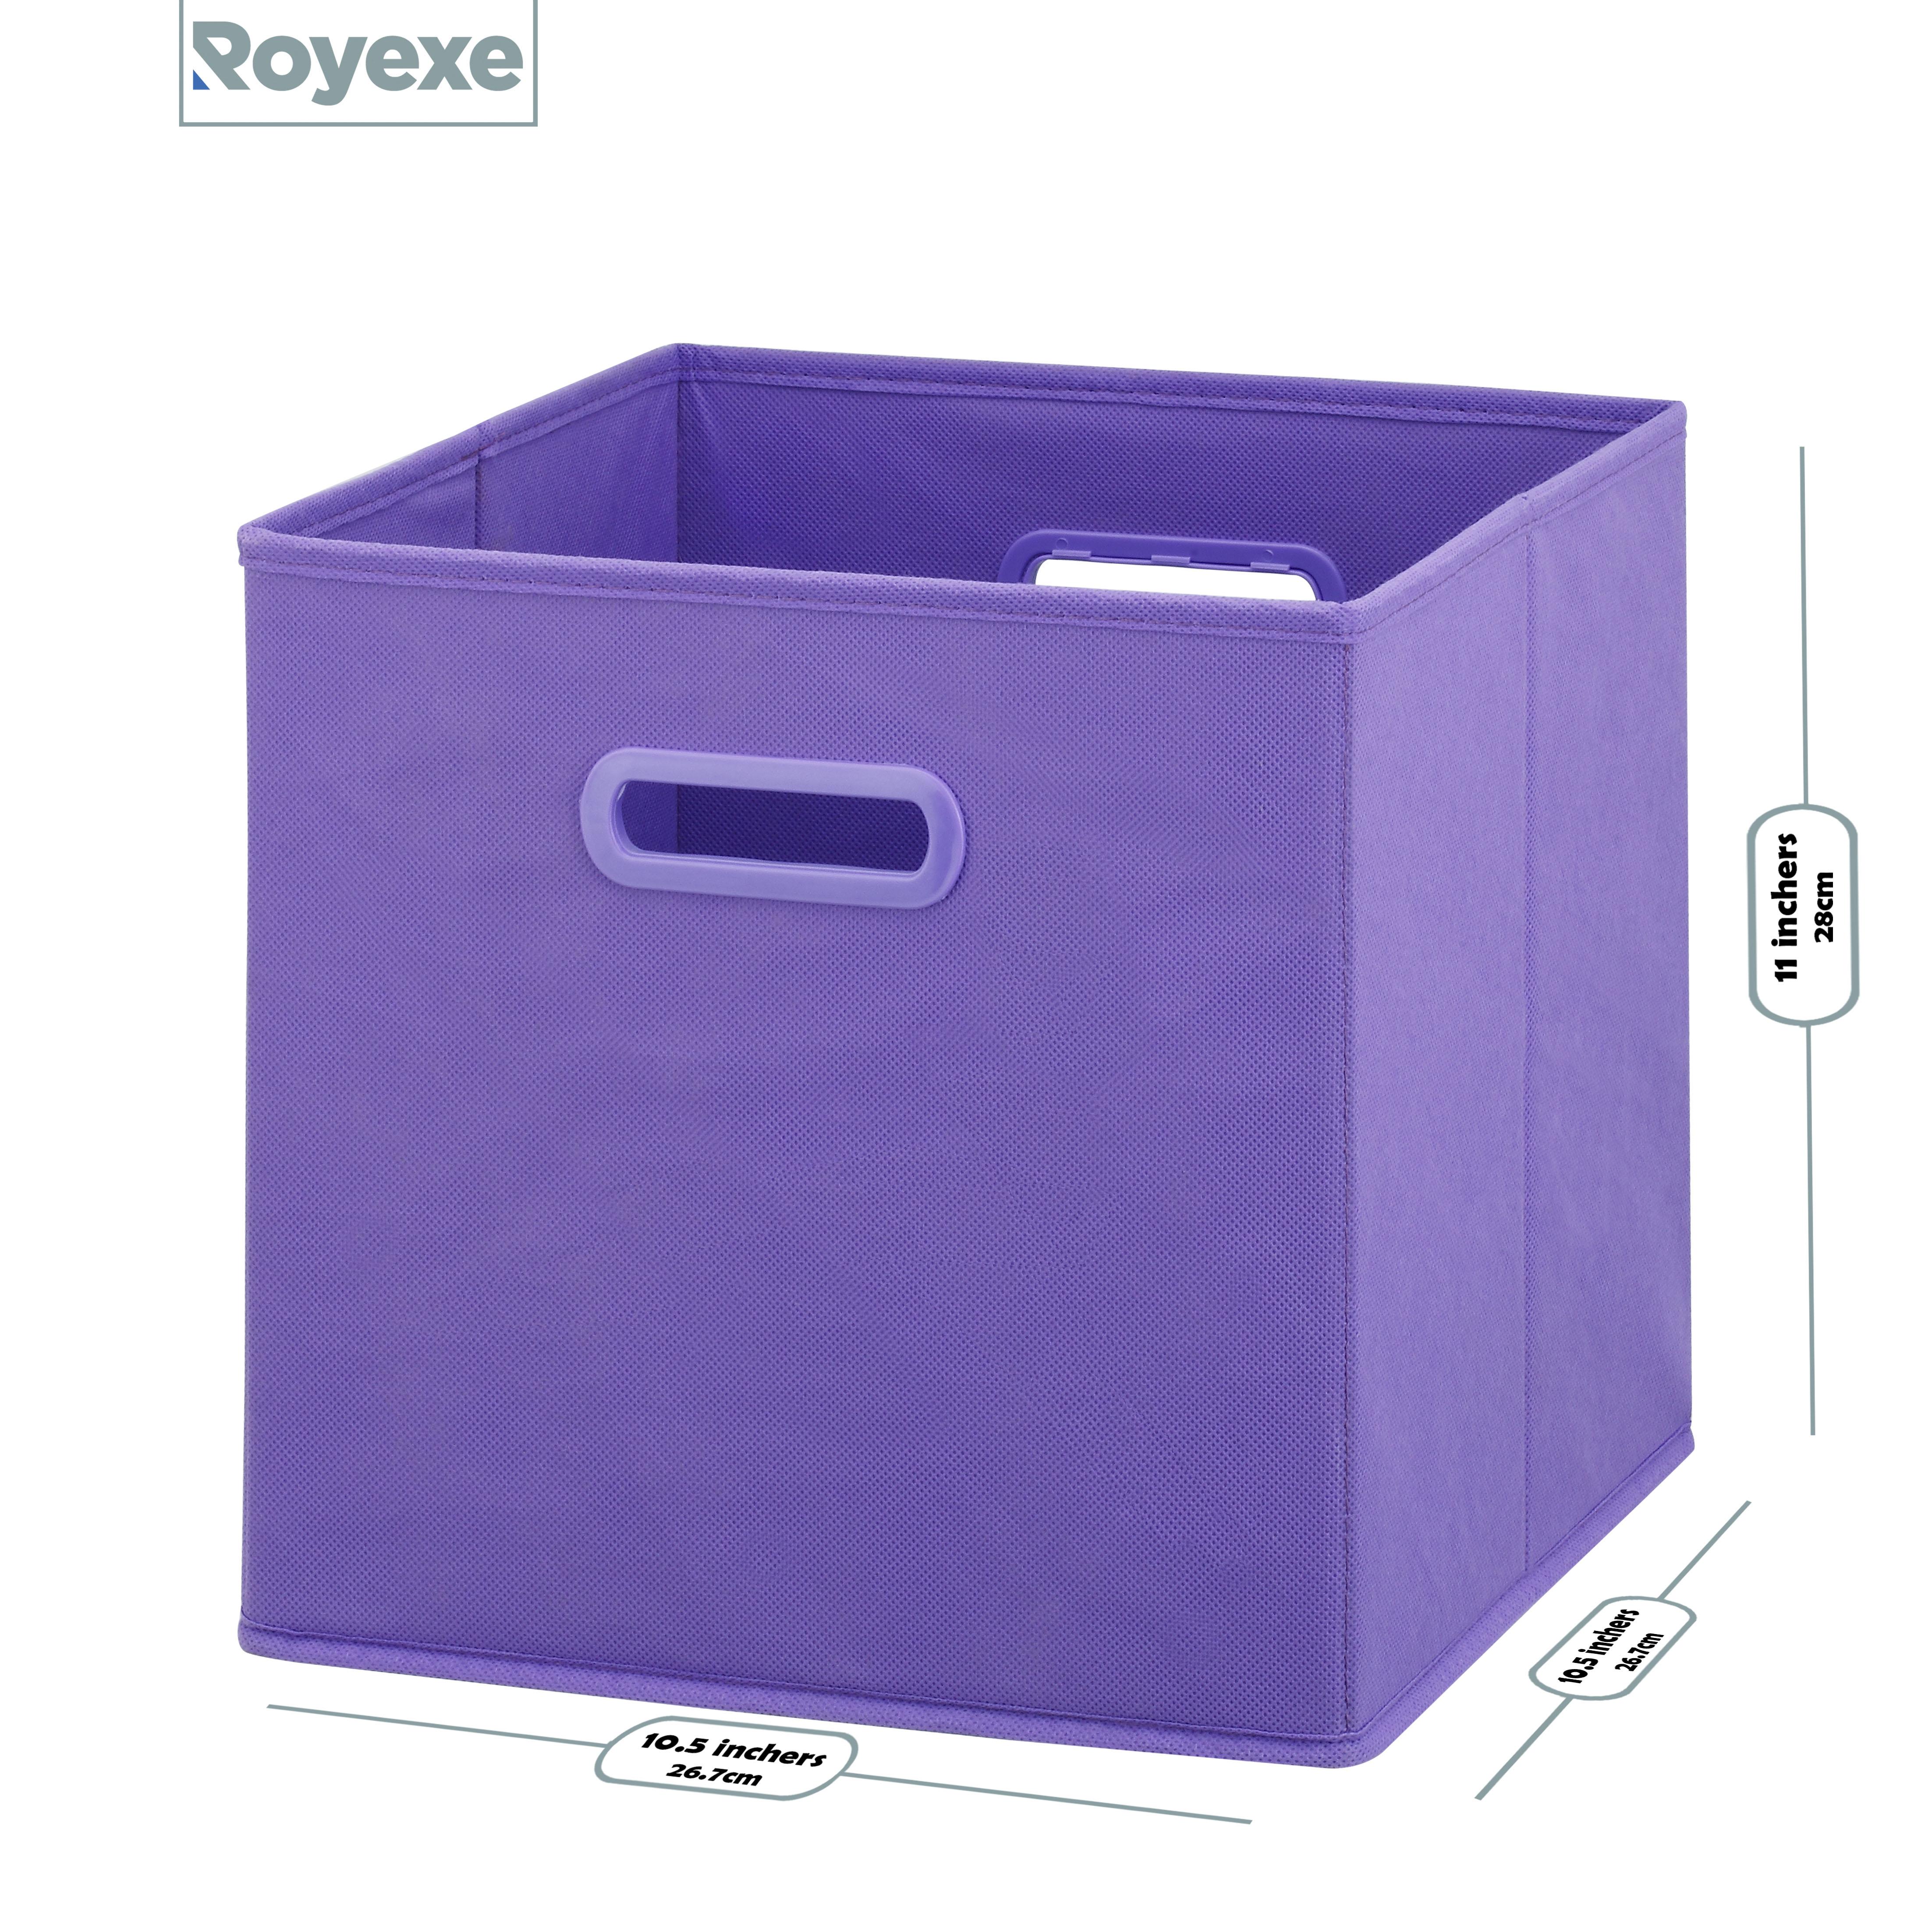 Cloth storage cubes